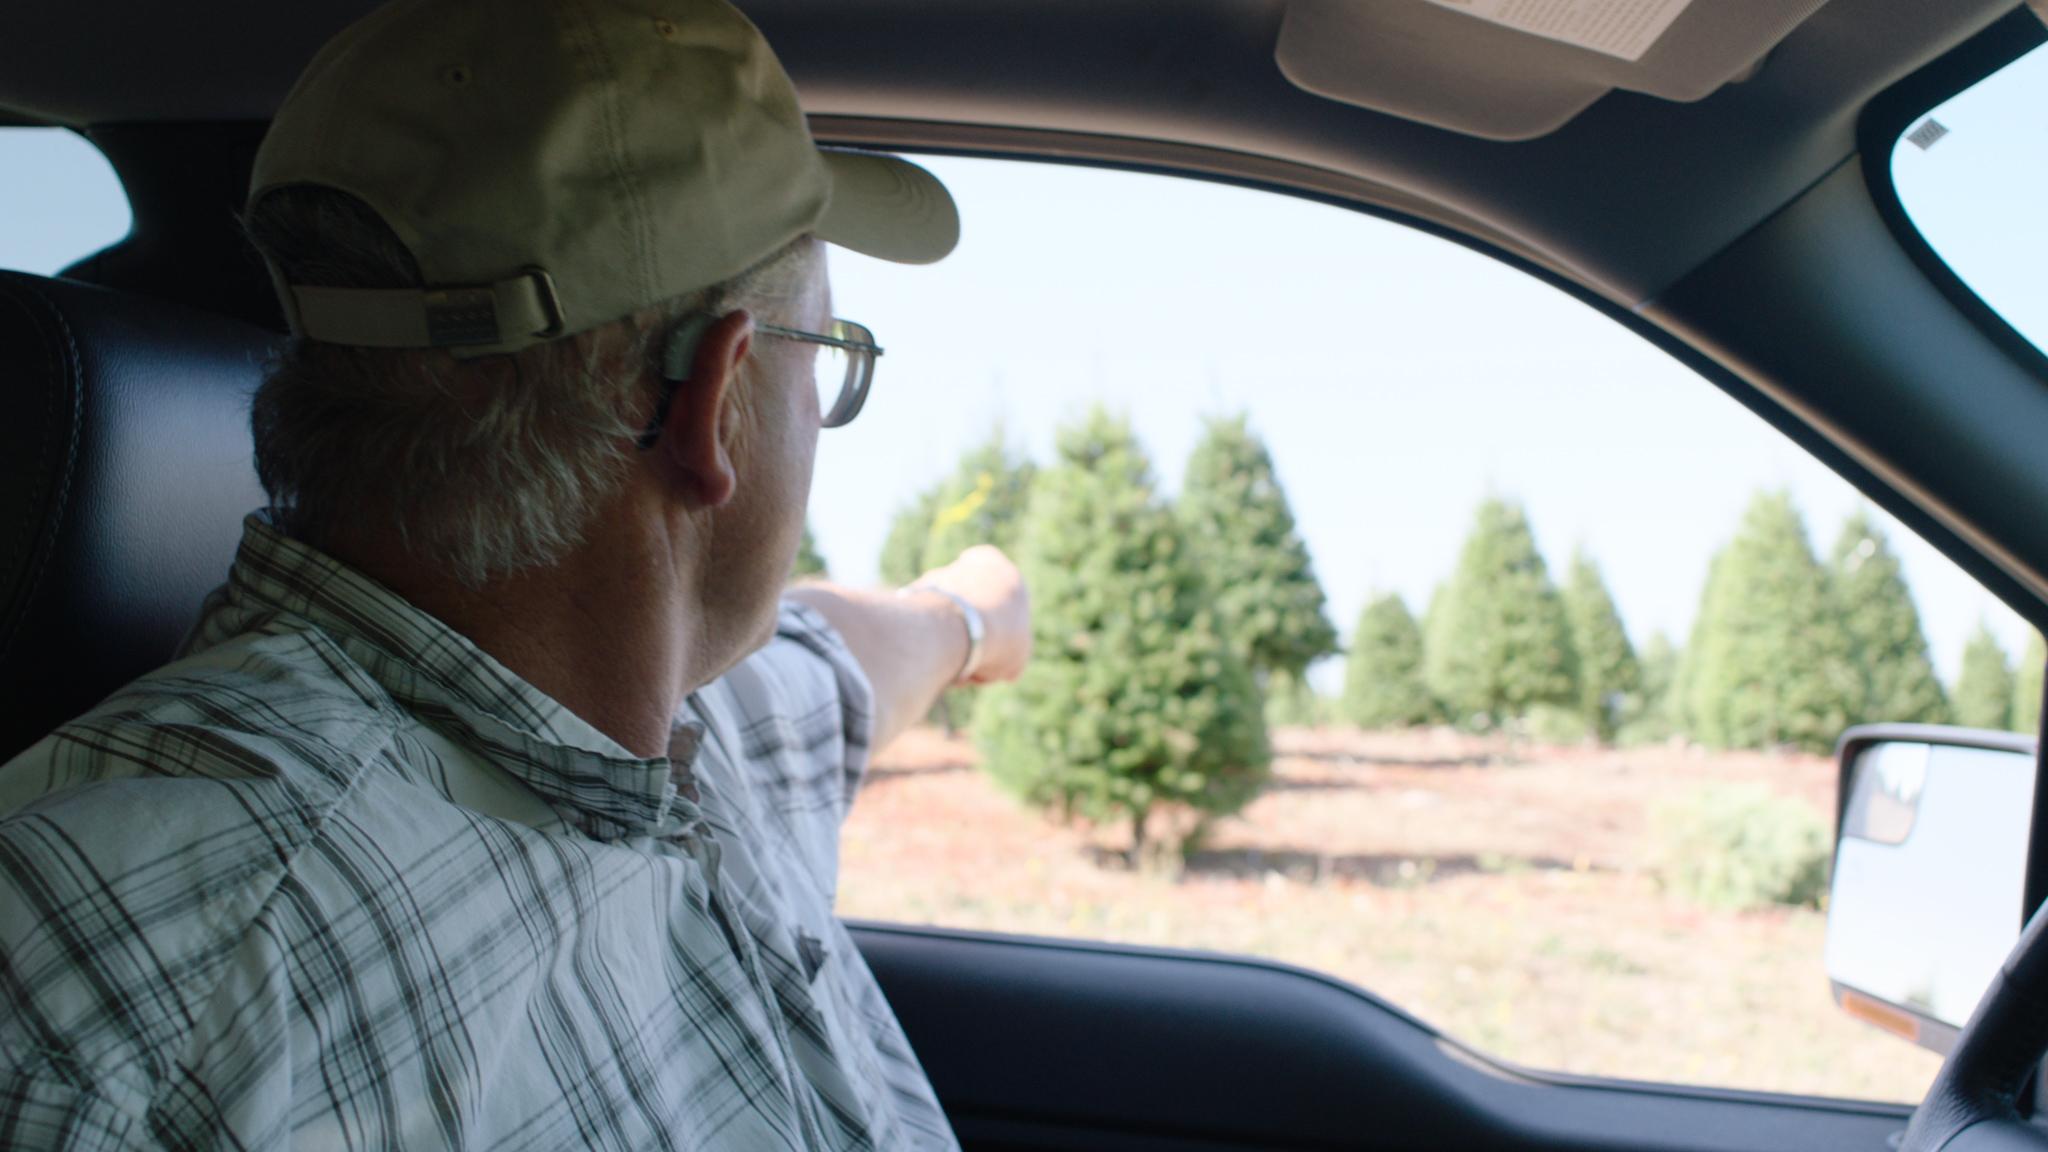 klm trees keep it real